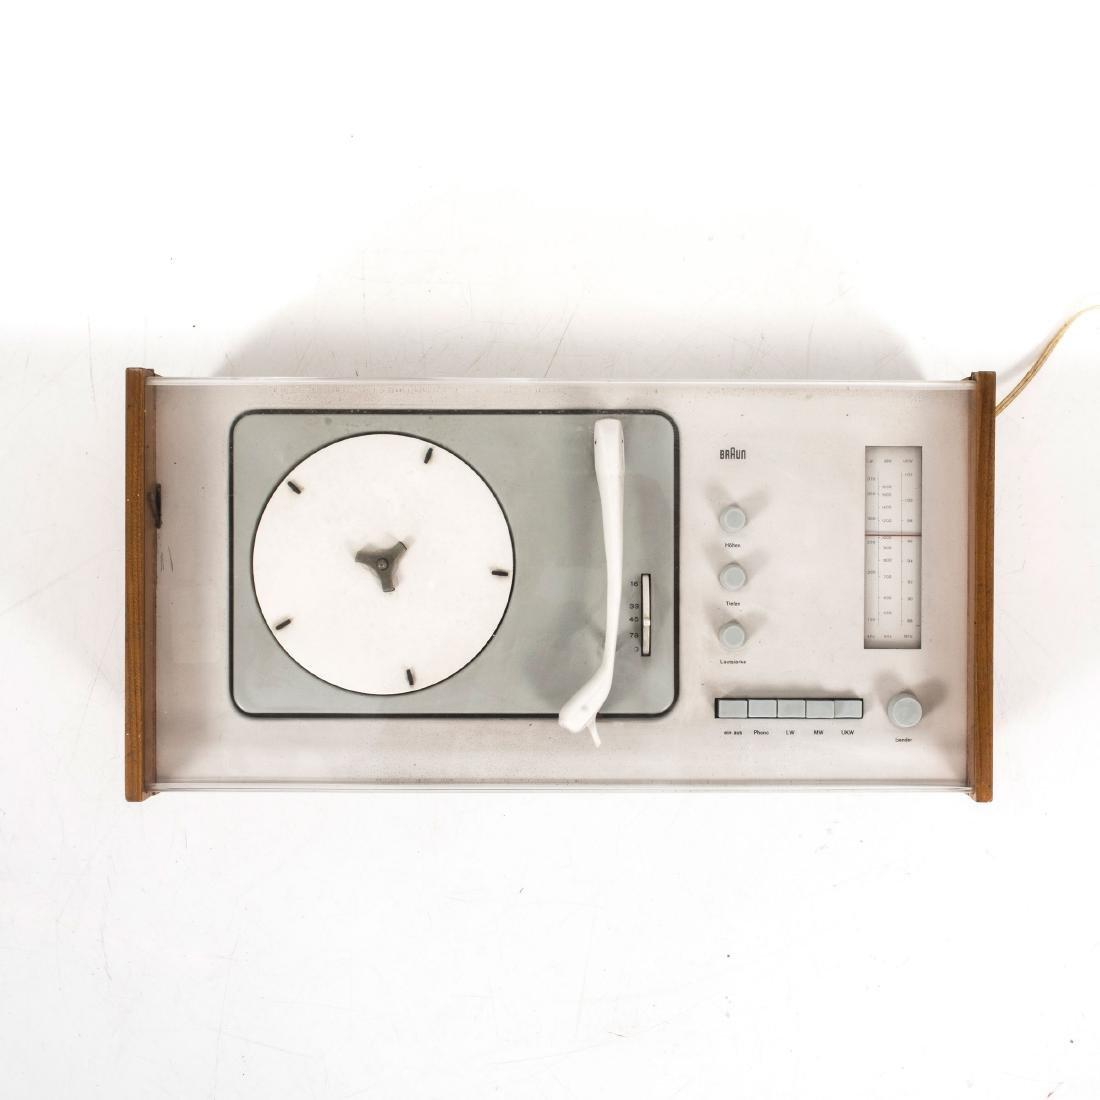 'SK 5' radio phono system, 1958 - 5